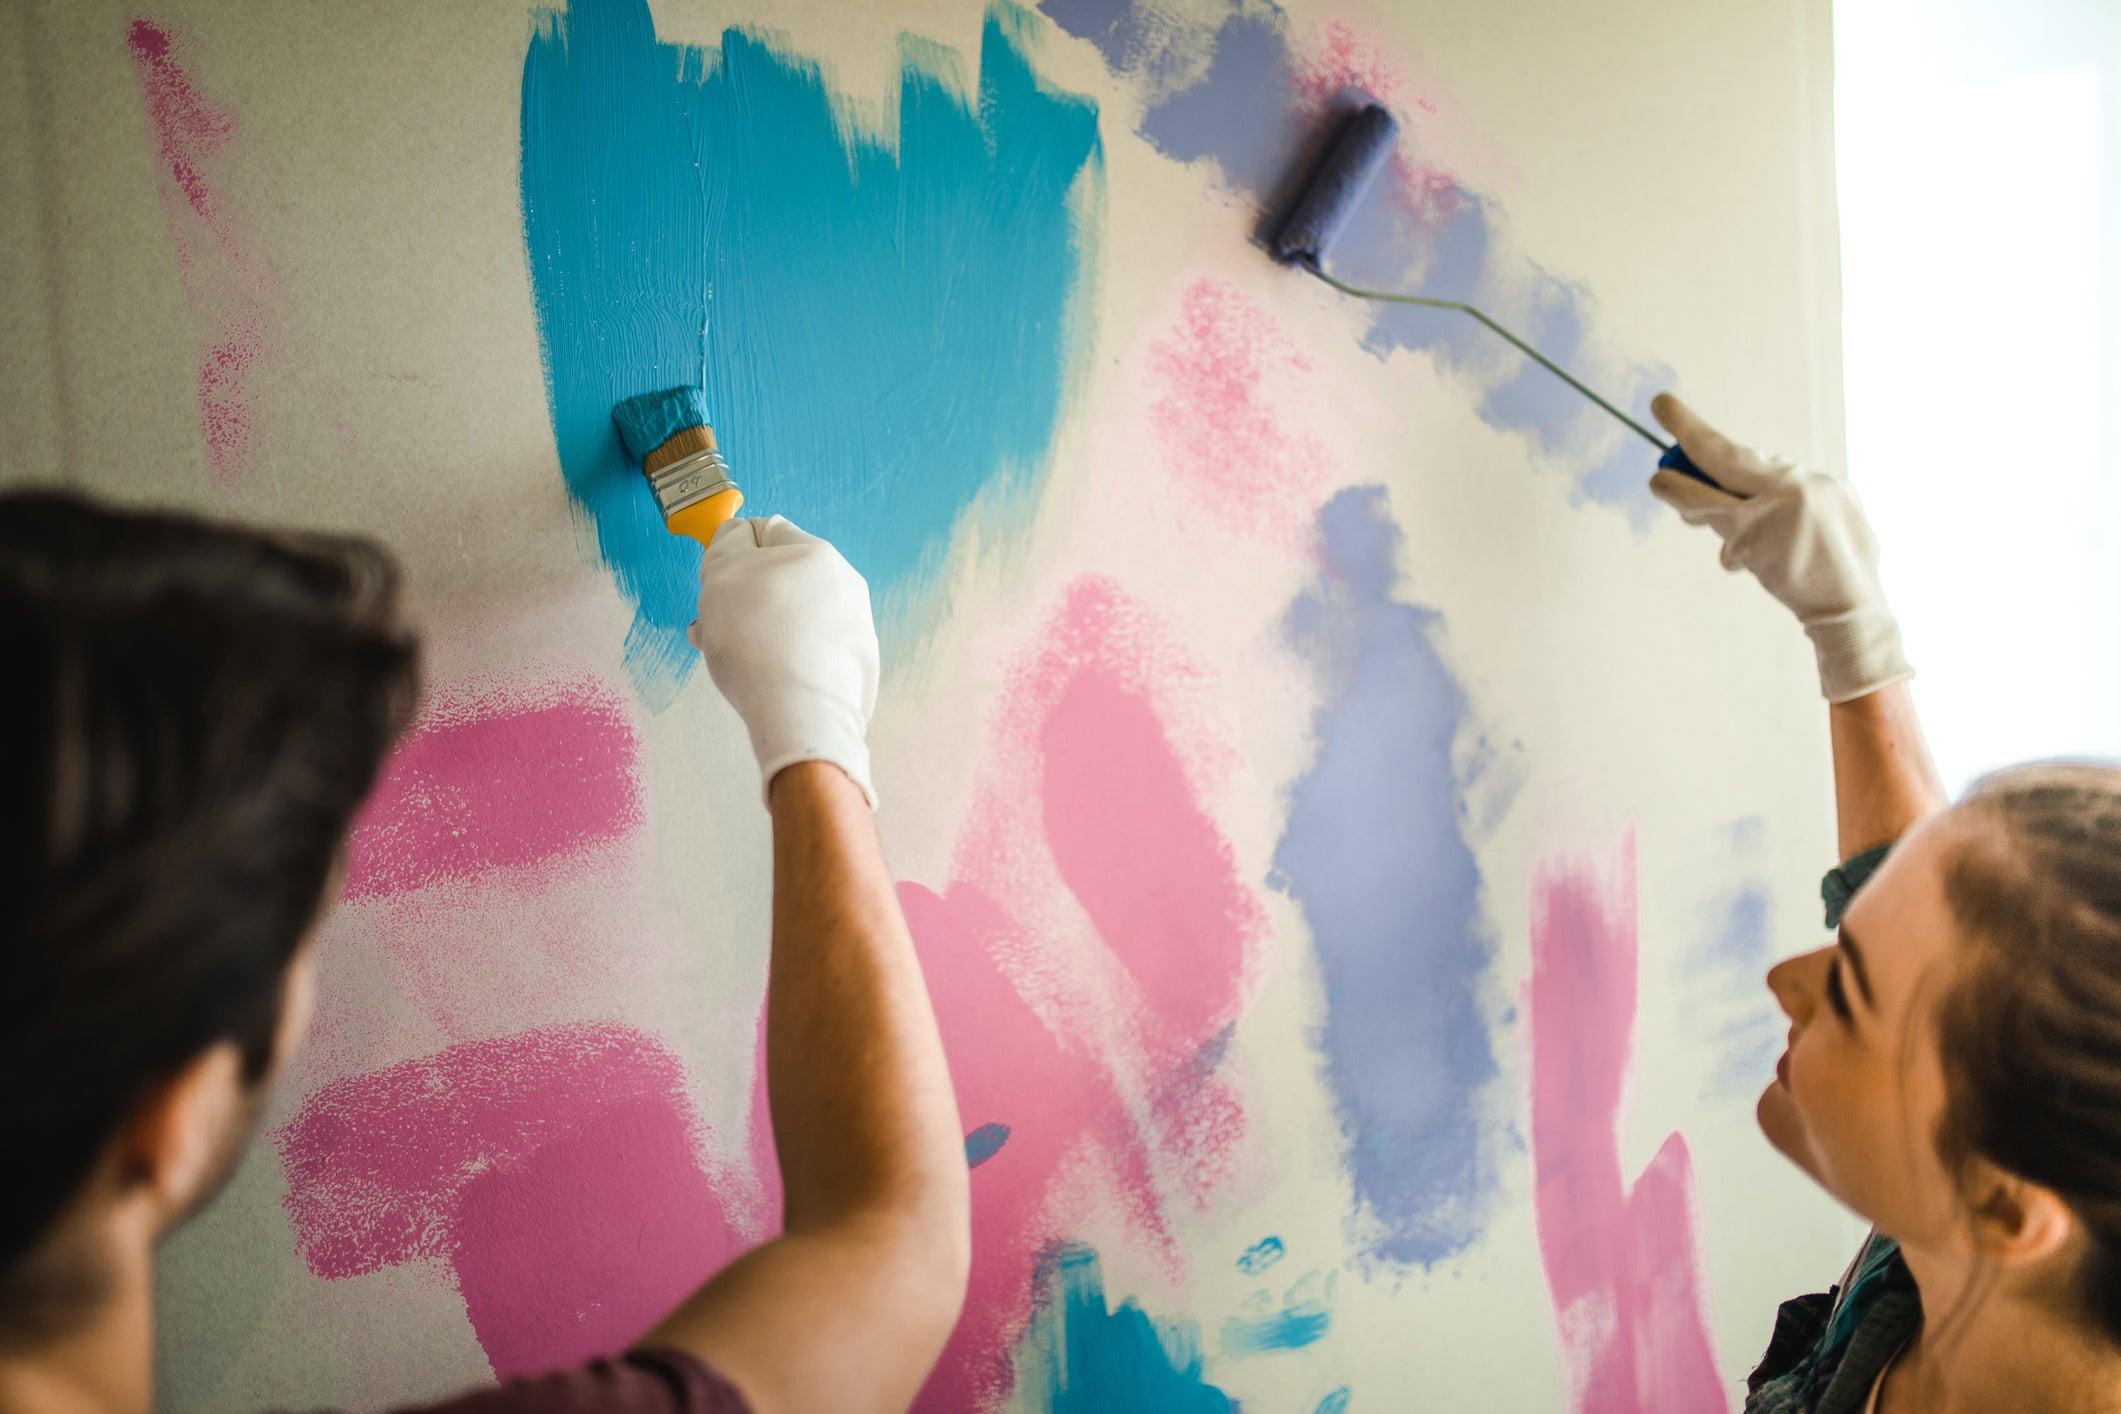 couple making home renovations